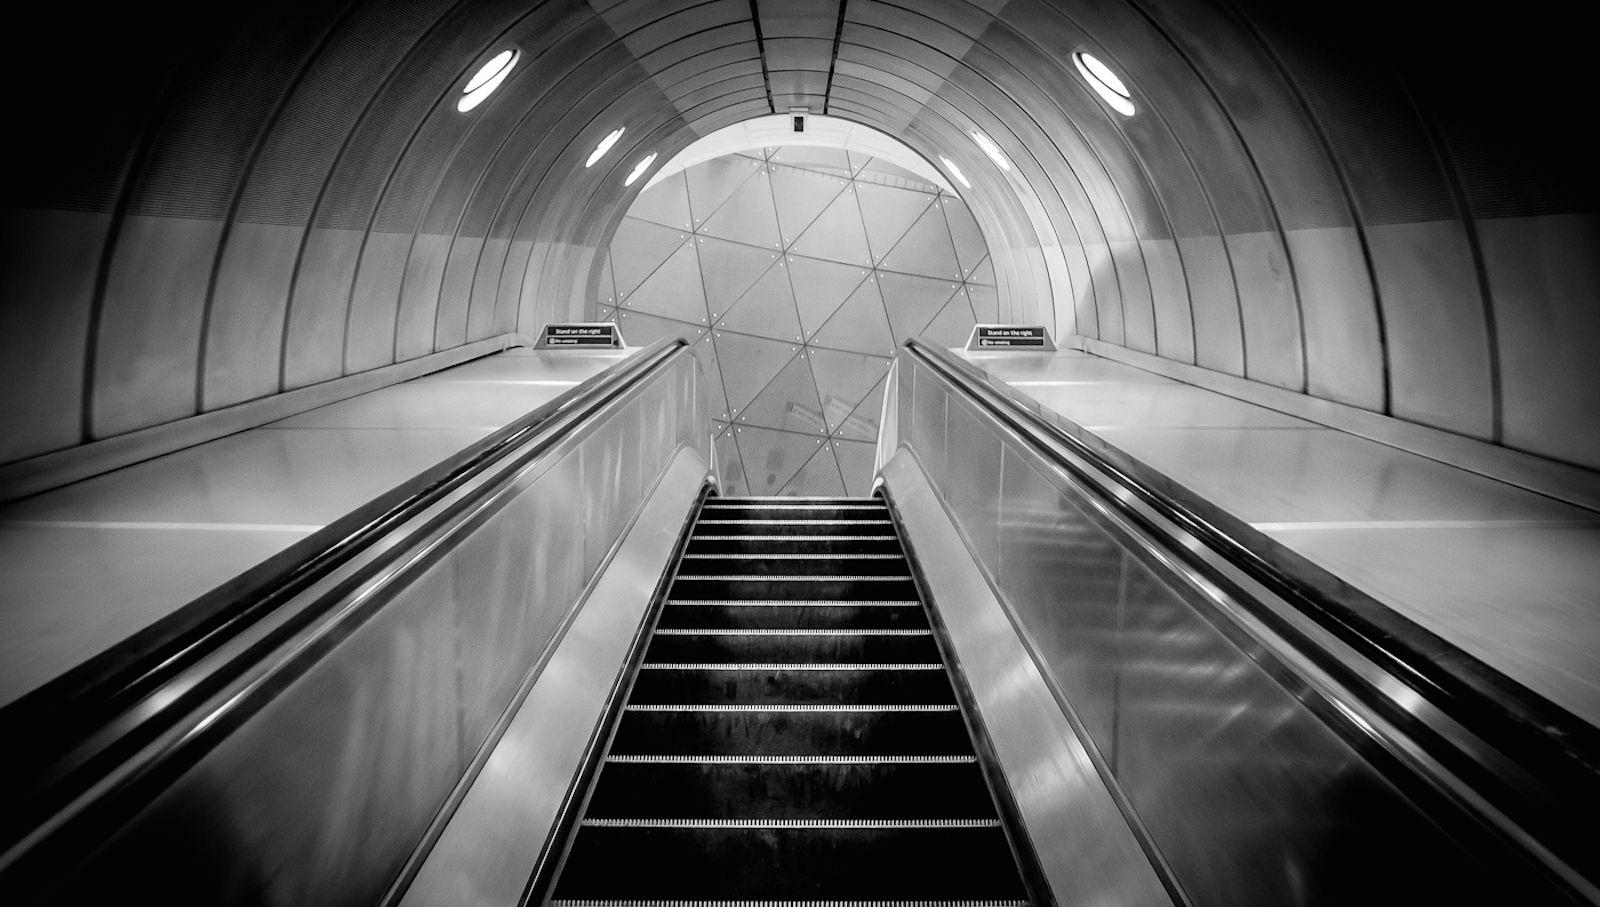 Empty escalator